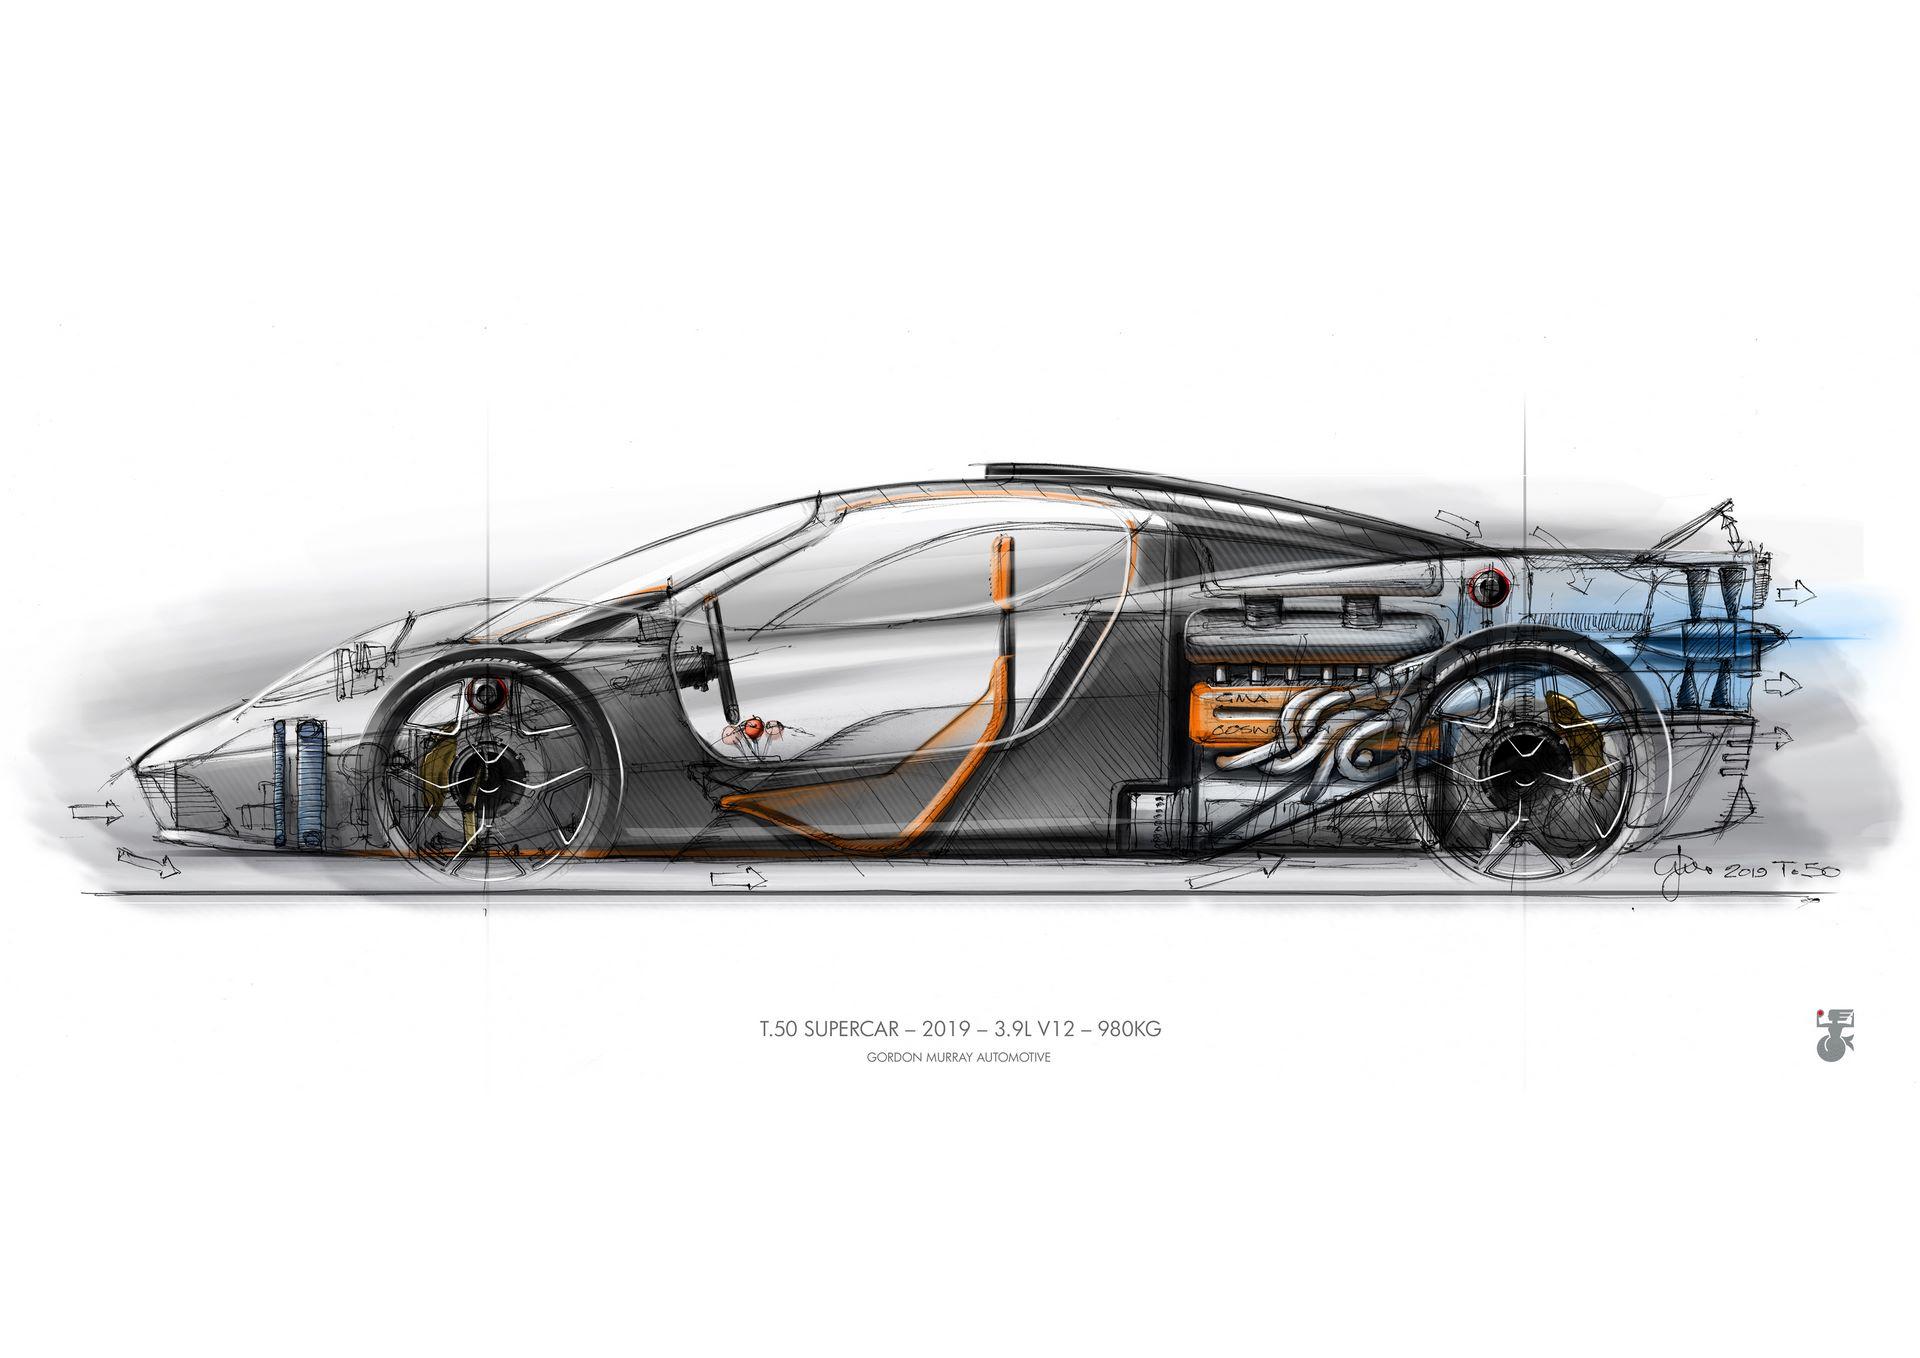 Gordon-Murray-Automotive-GMA-T50-51